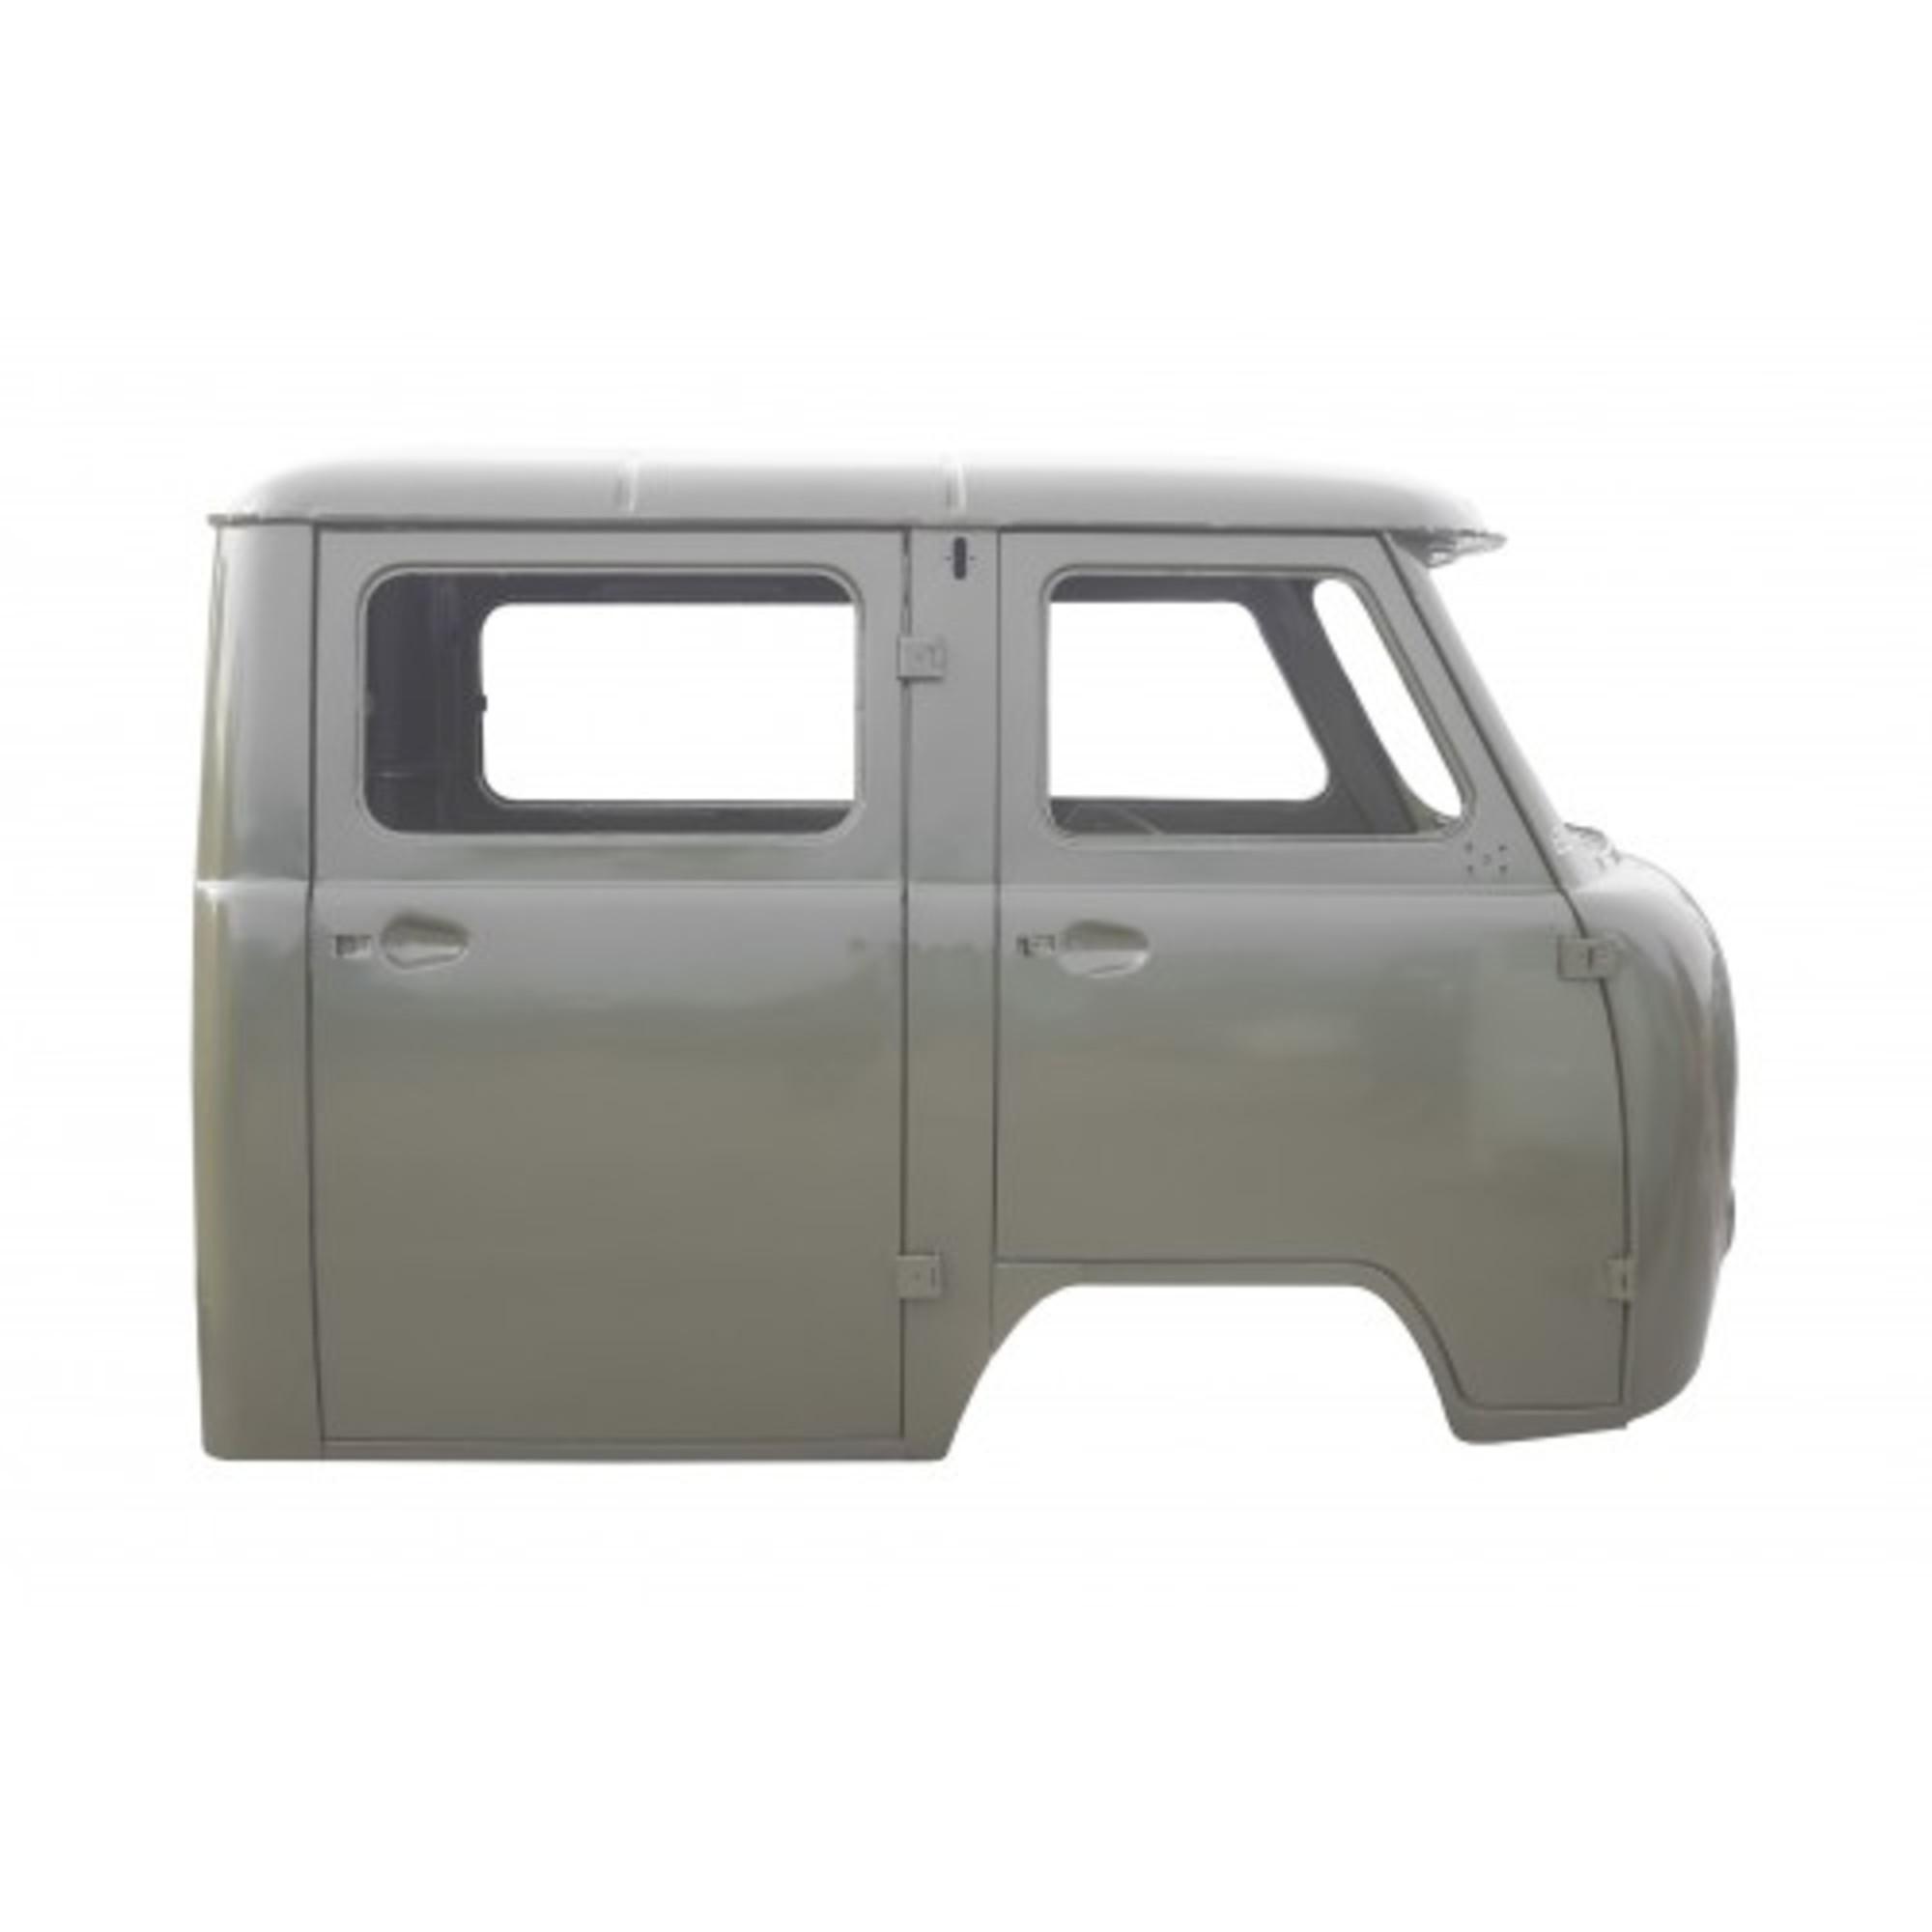 Каркас кузова УАЗ-39094 фермер Защитный